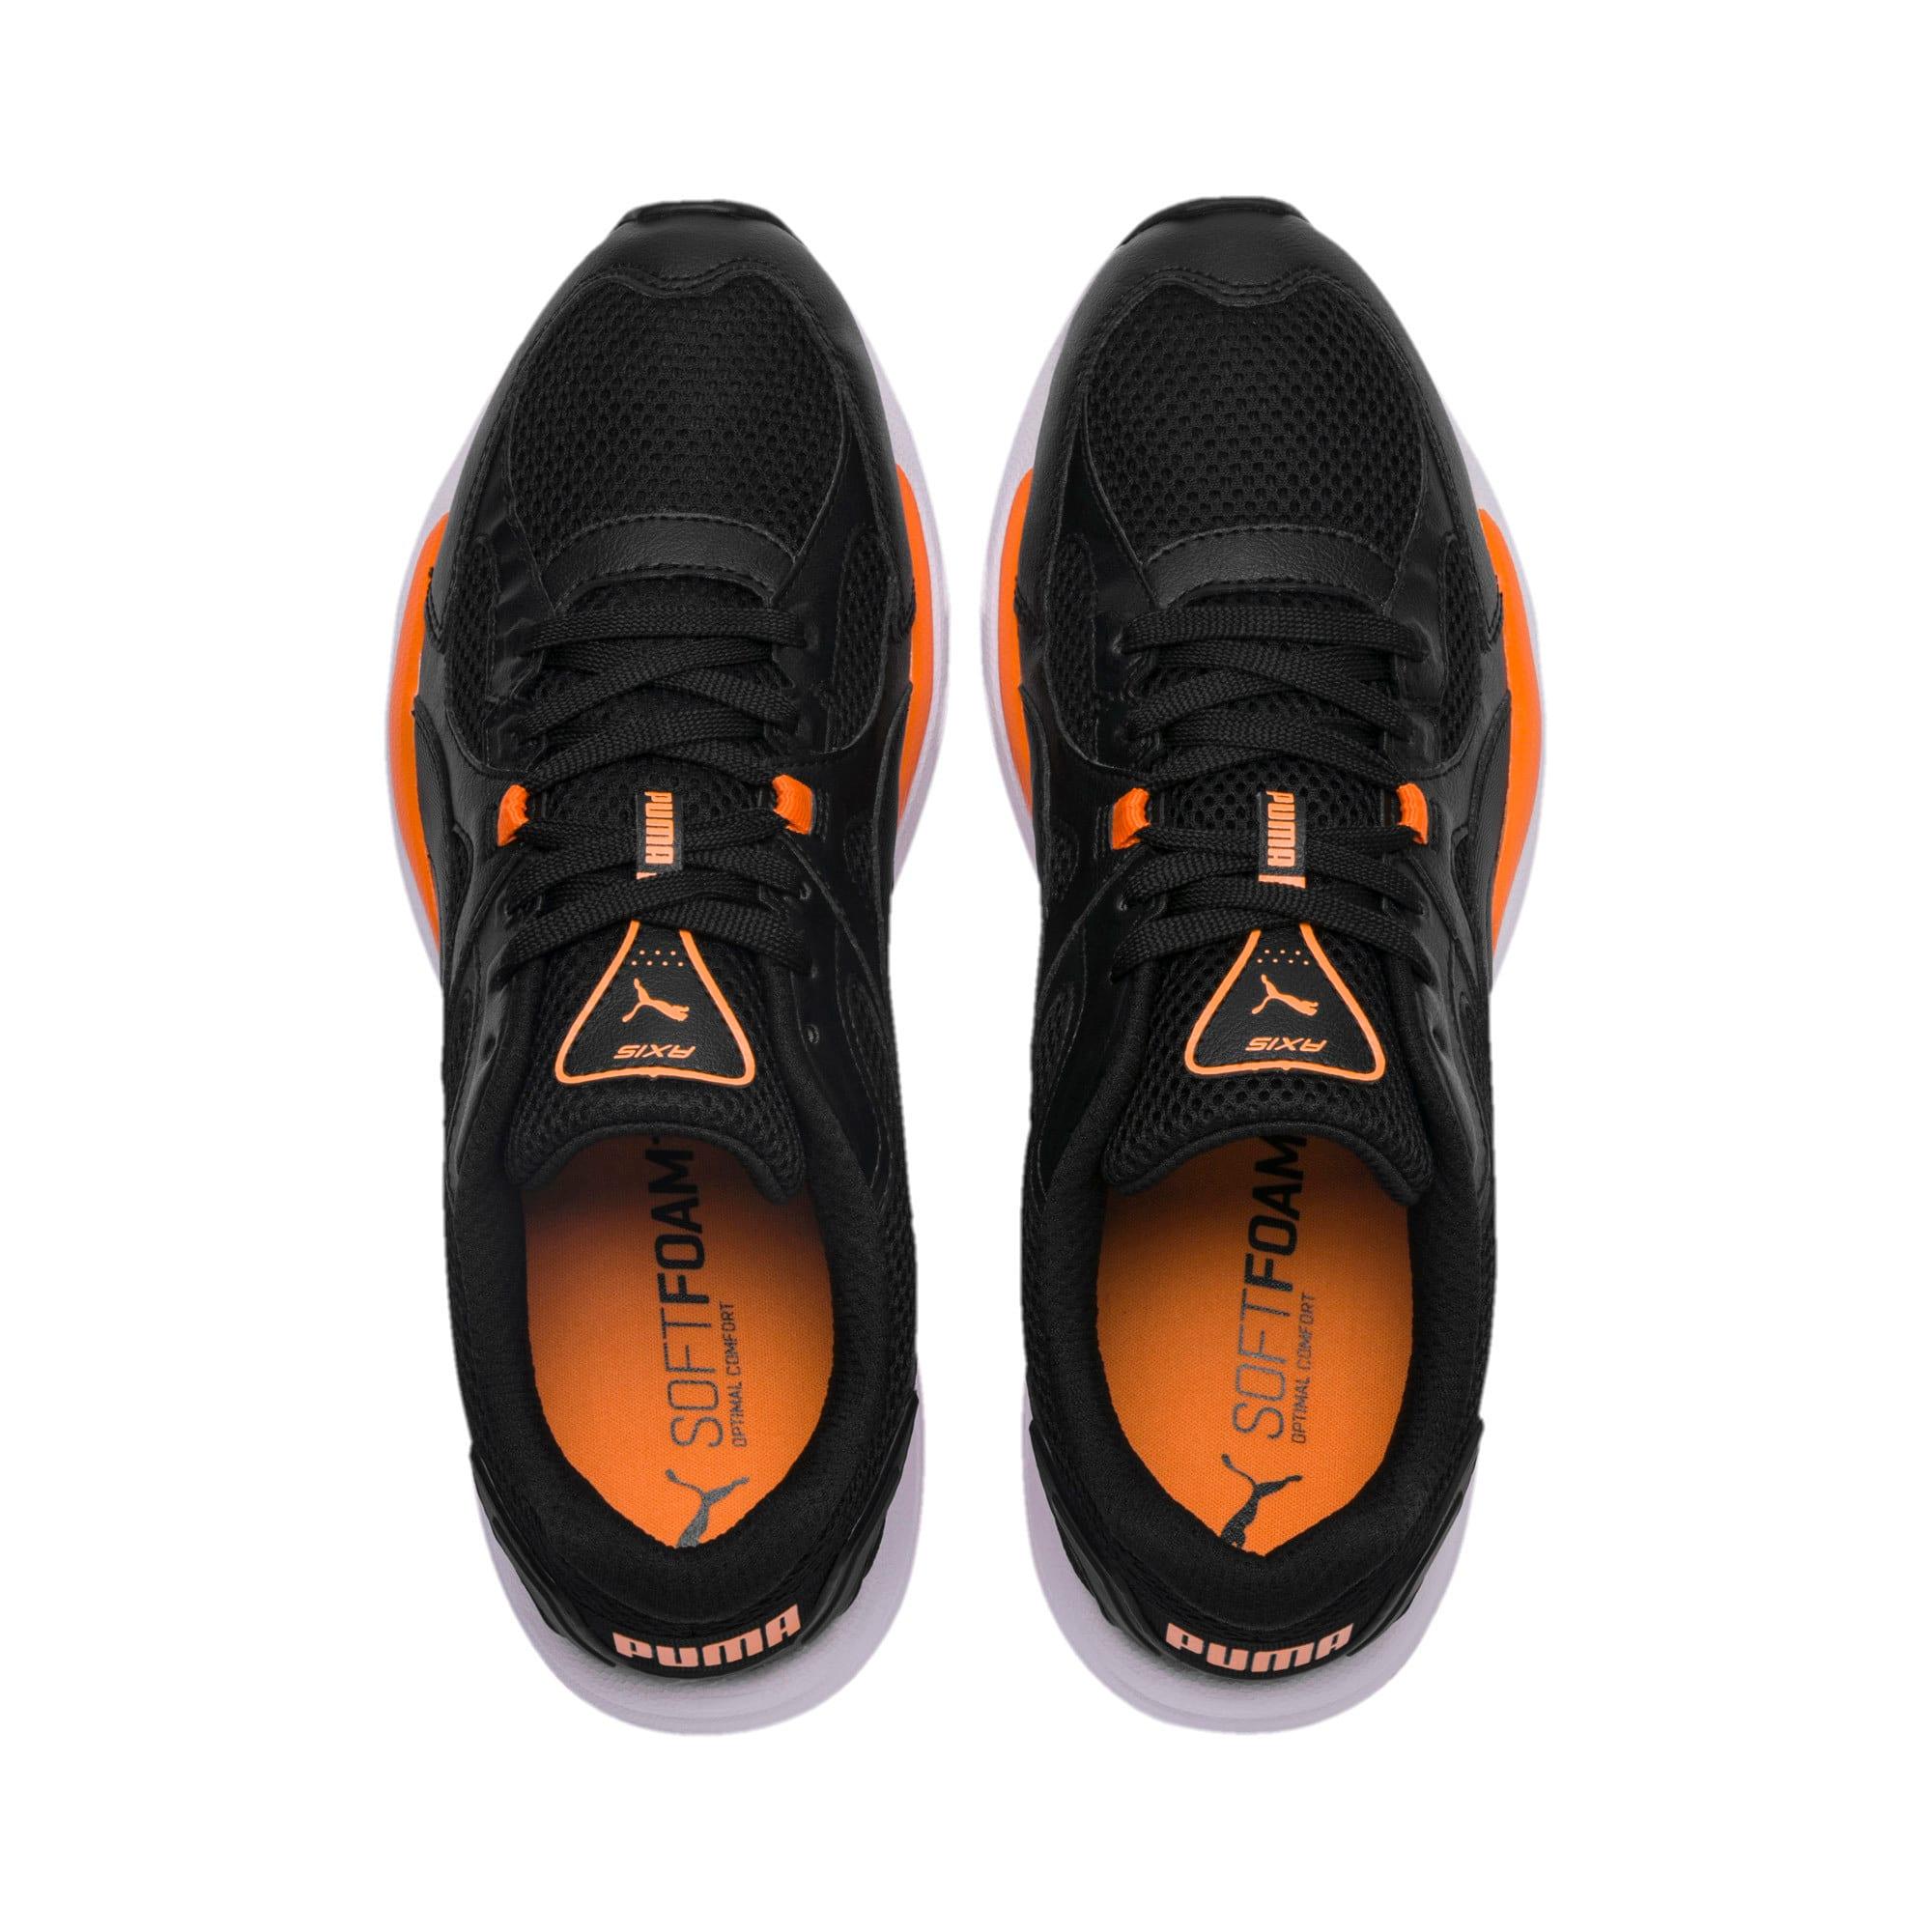 Thumbnail 6 of Axis Plus 90s Sneakers, Puma Black-Puma Black, medium